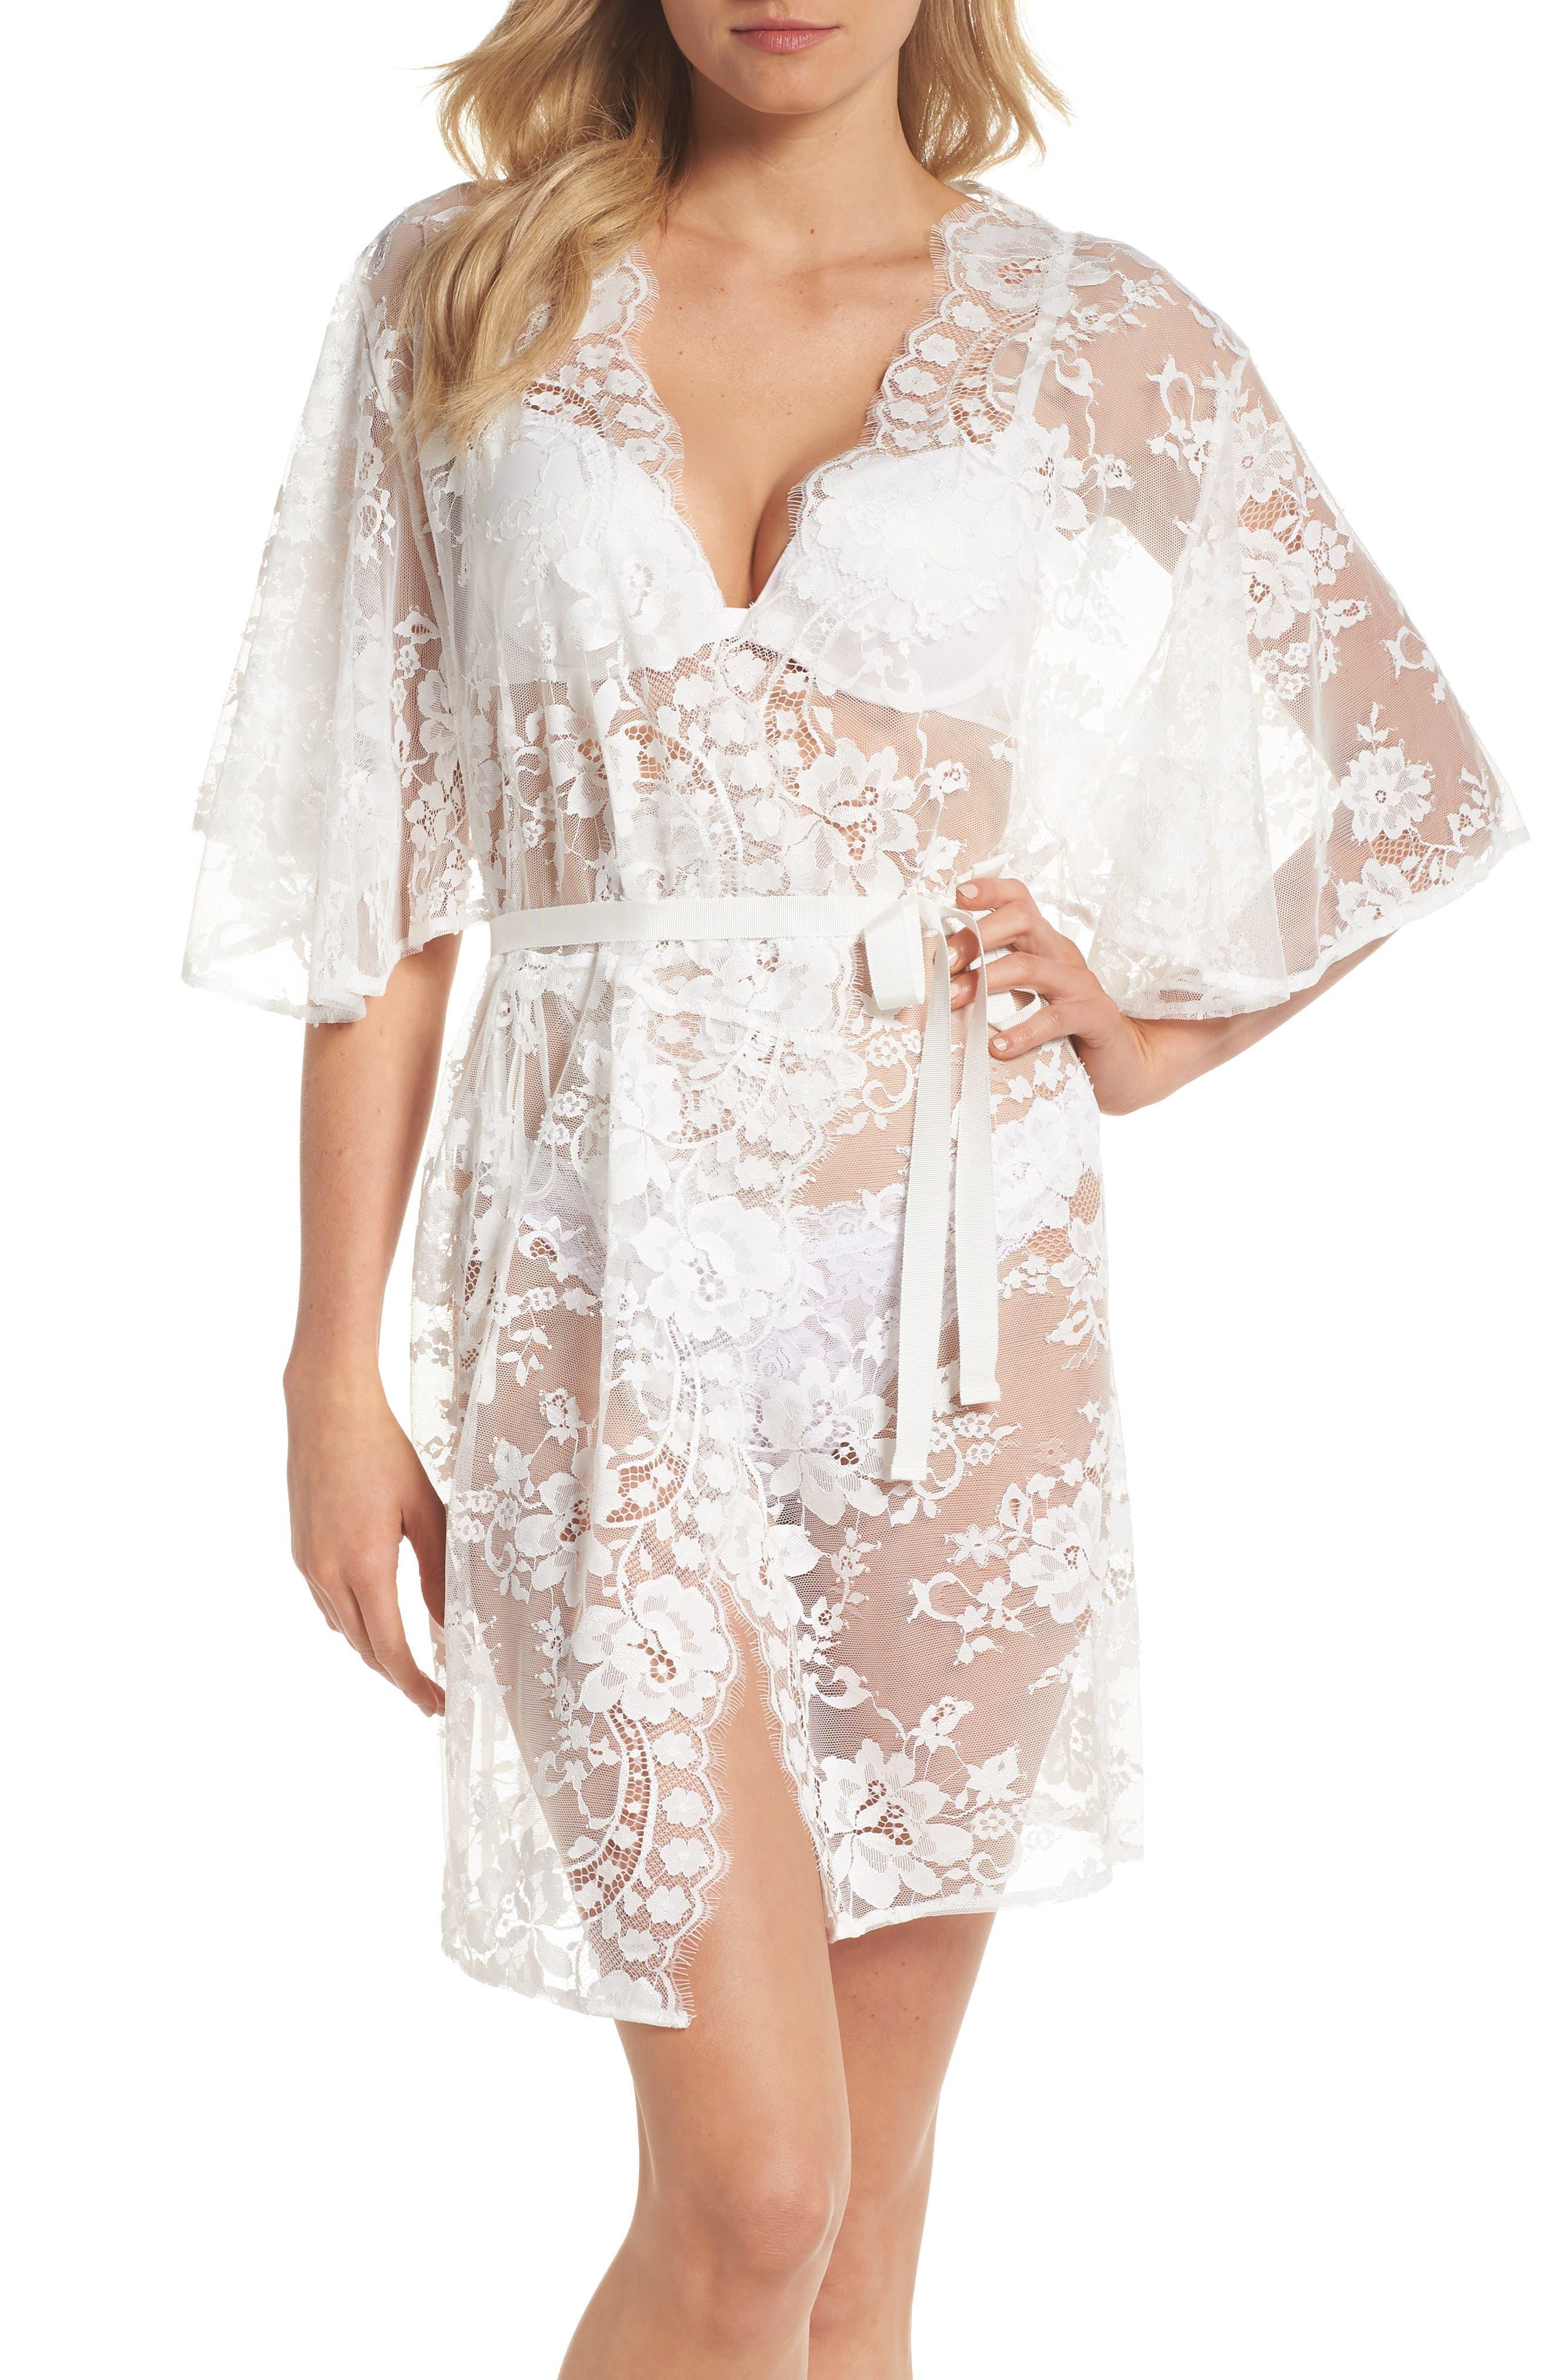 Homebodii Kassiah Short Lace Wrap